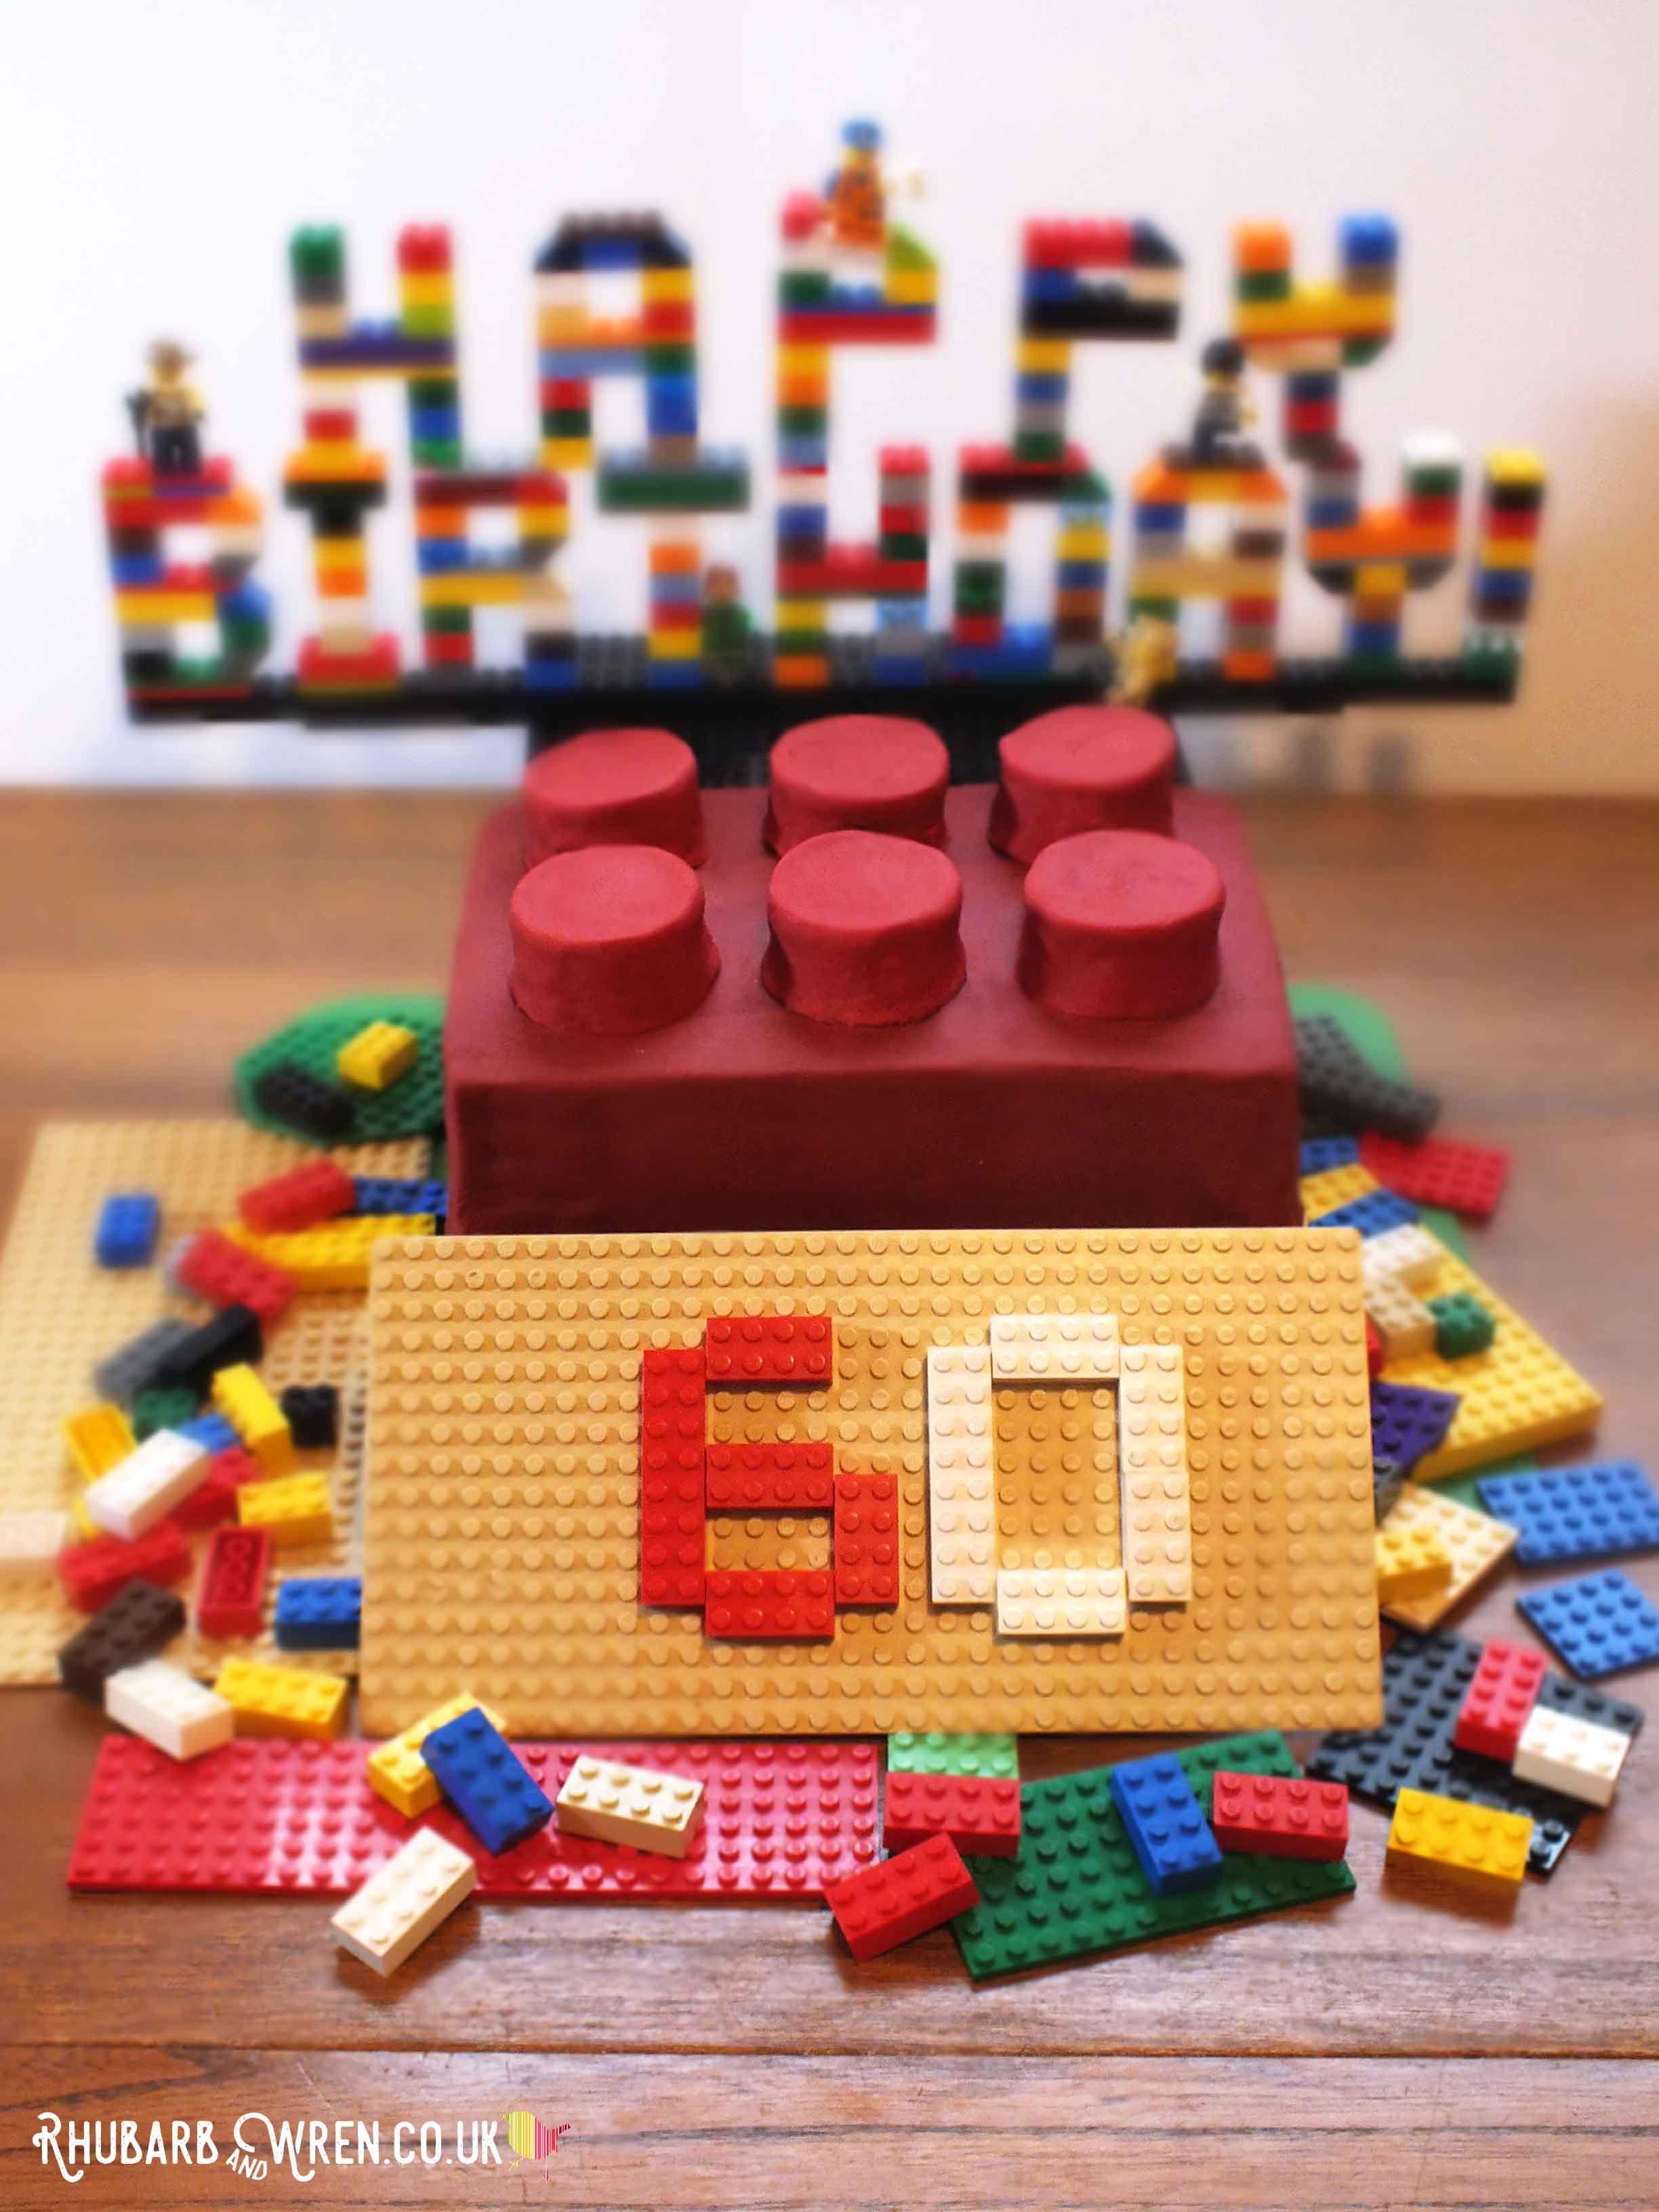 A giant lego brick made of cake